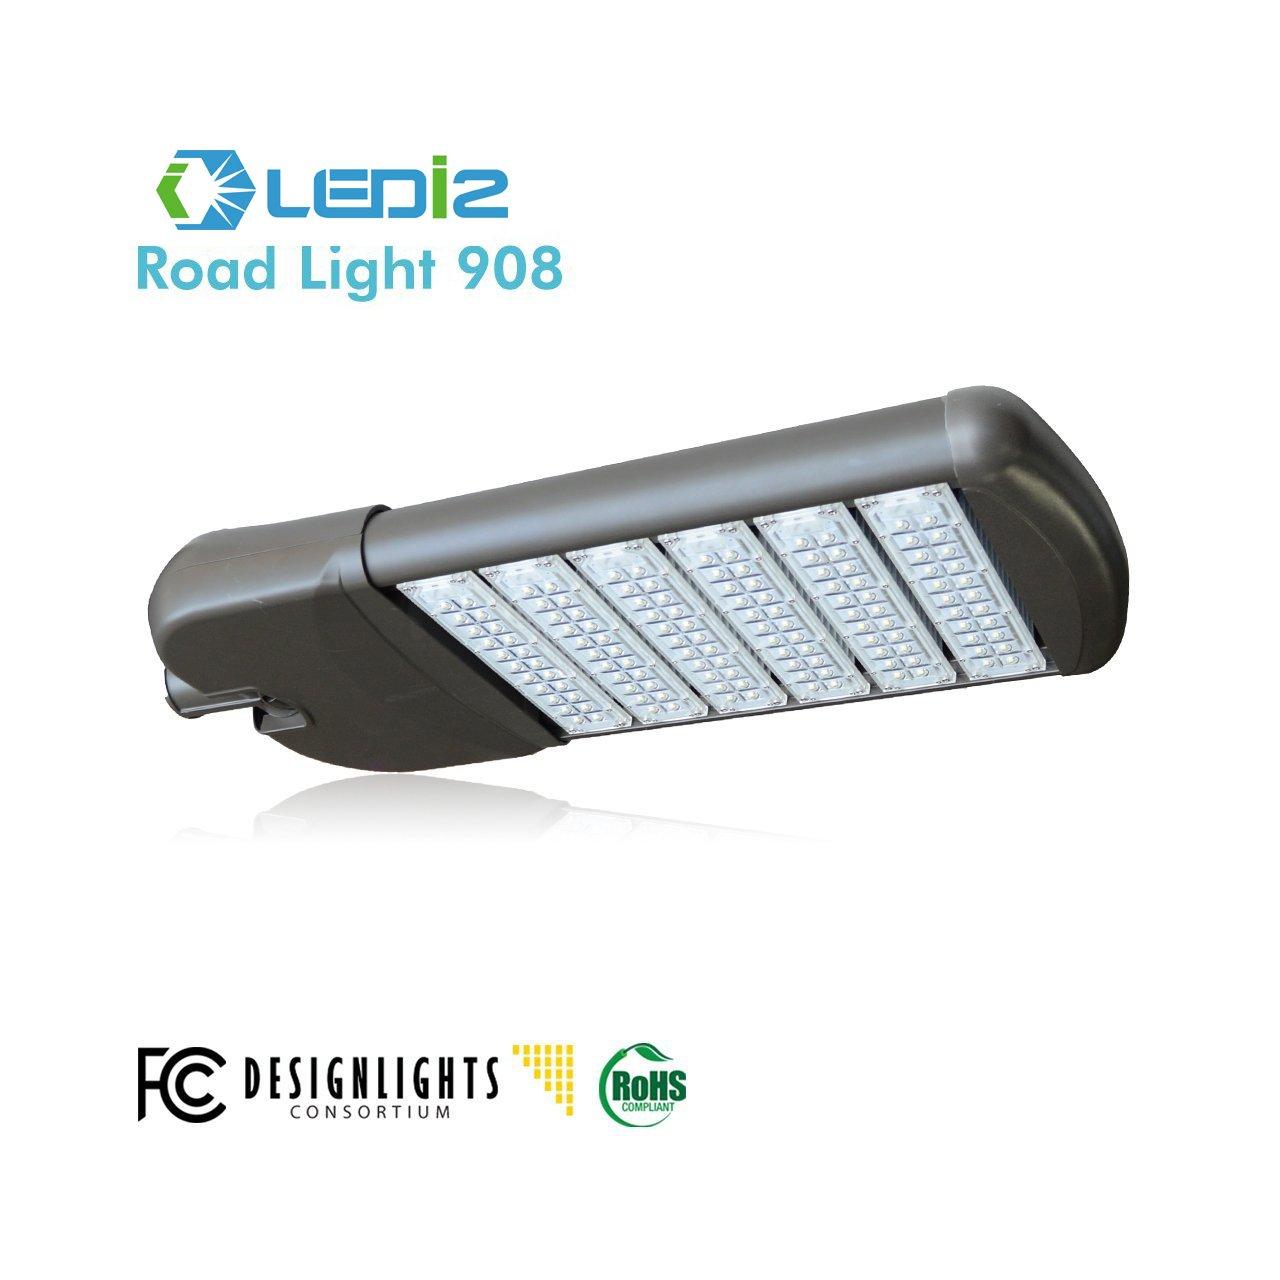 LEDi2 LED Road Light Parking Lot Light Area Light Houston 908, 280W, 5000K, AC120-277V, CRI:70, Lumen 29,400, 105Lm/W Phillips Driver, 5 year limited warranty